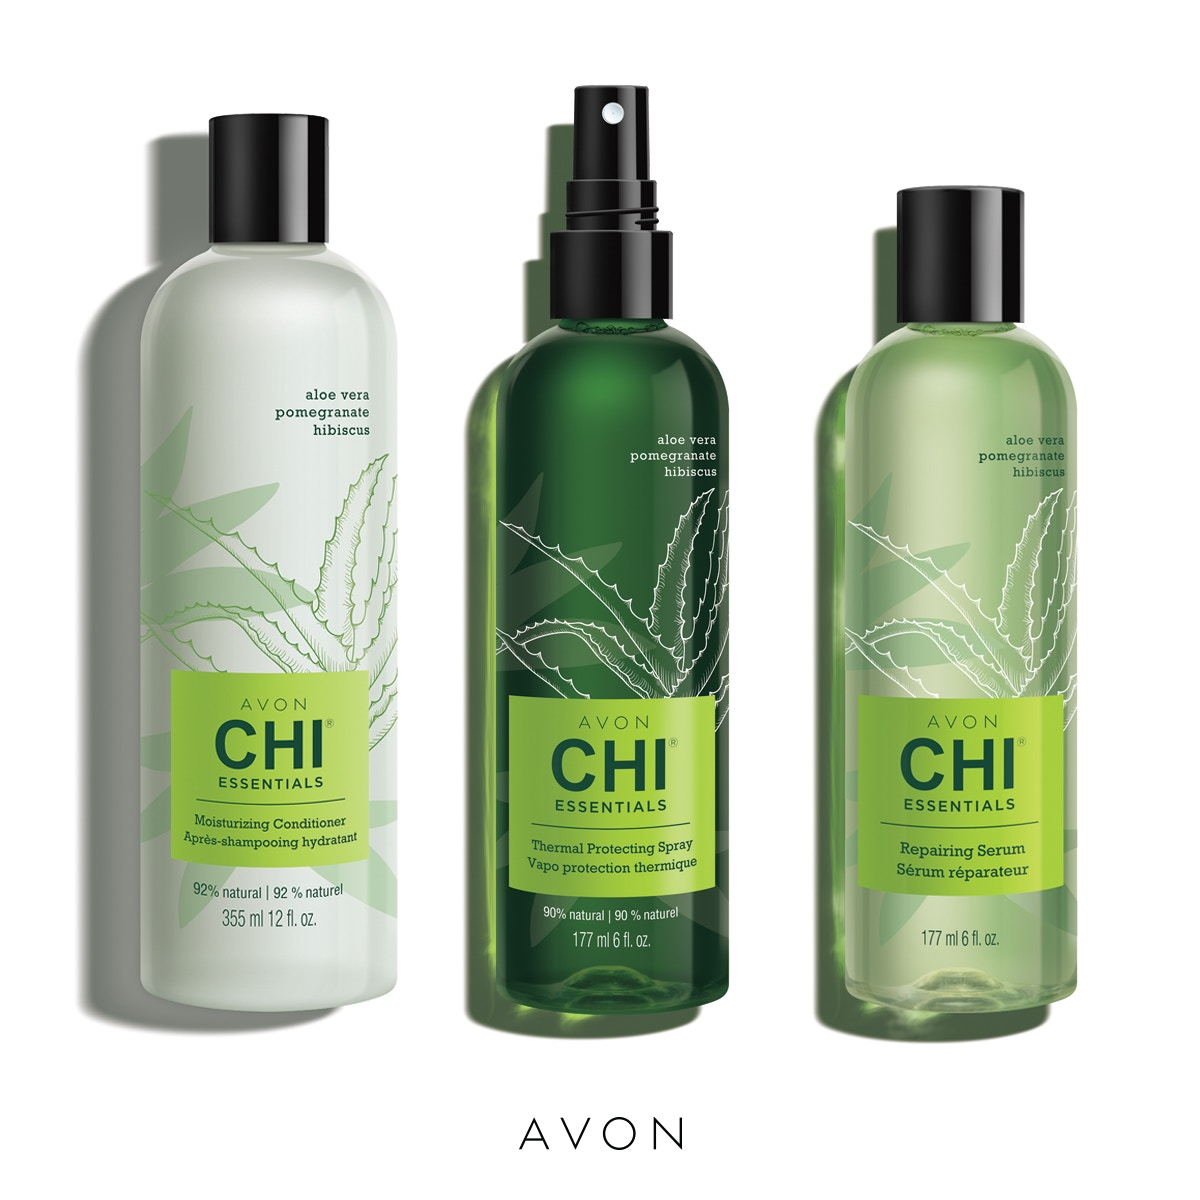 #Avon Chi Essentials - Buy 1, Select 1 Half Price!